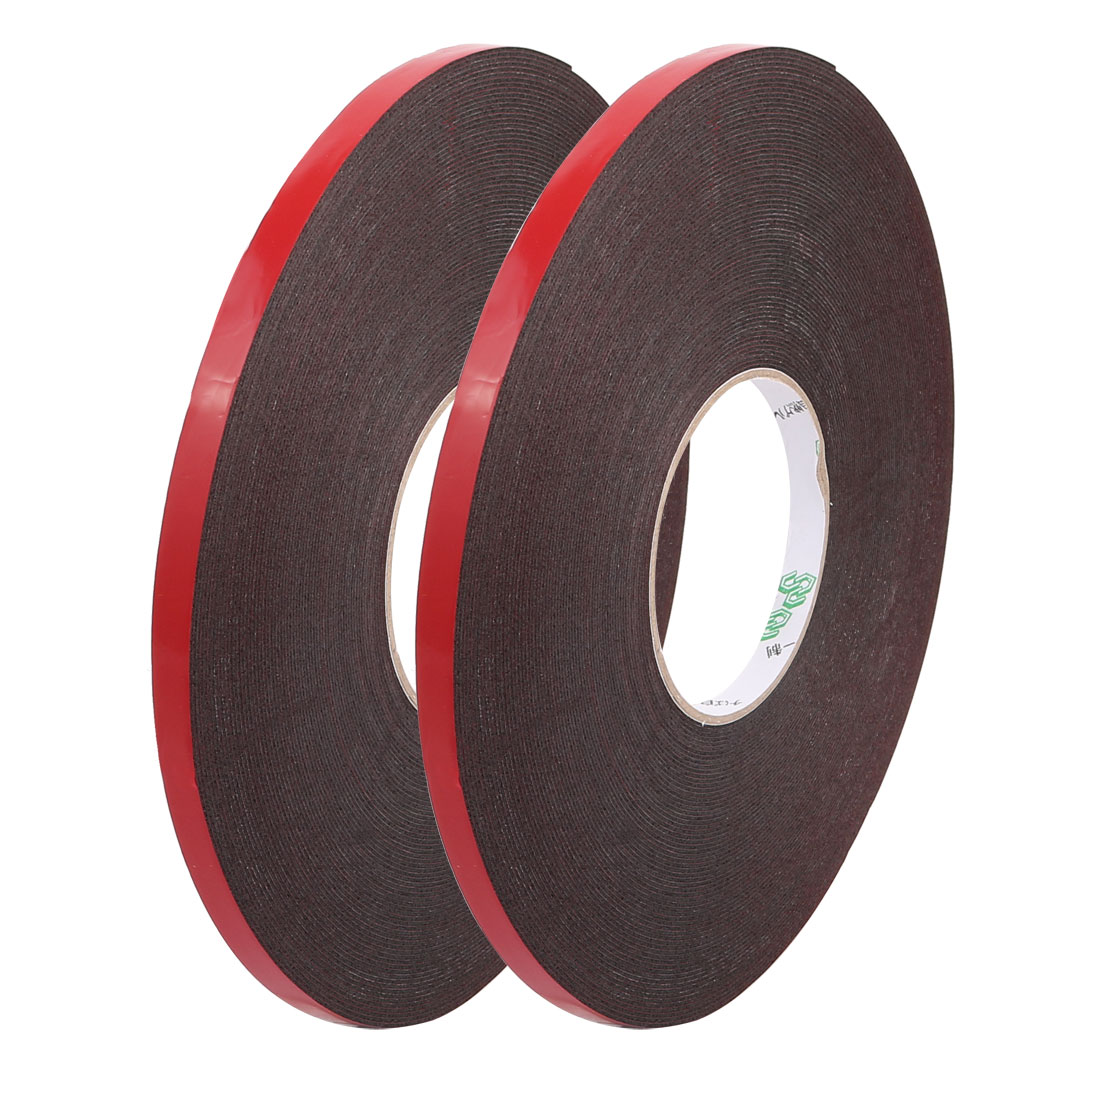 2pcs 10mmx1mm 30M Length PE Foam Sponge Tape Double Side Adhesive Marking Tool